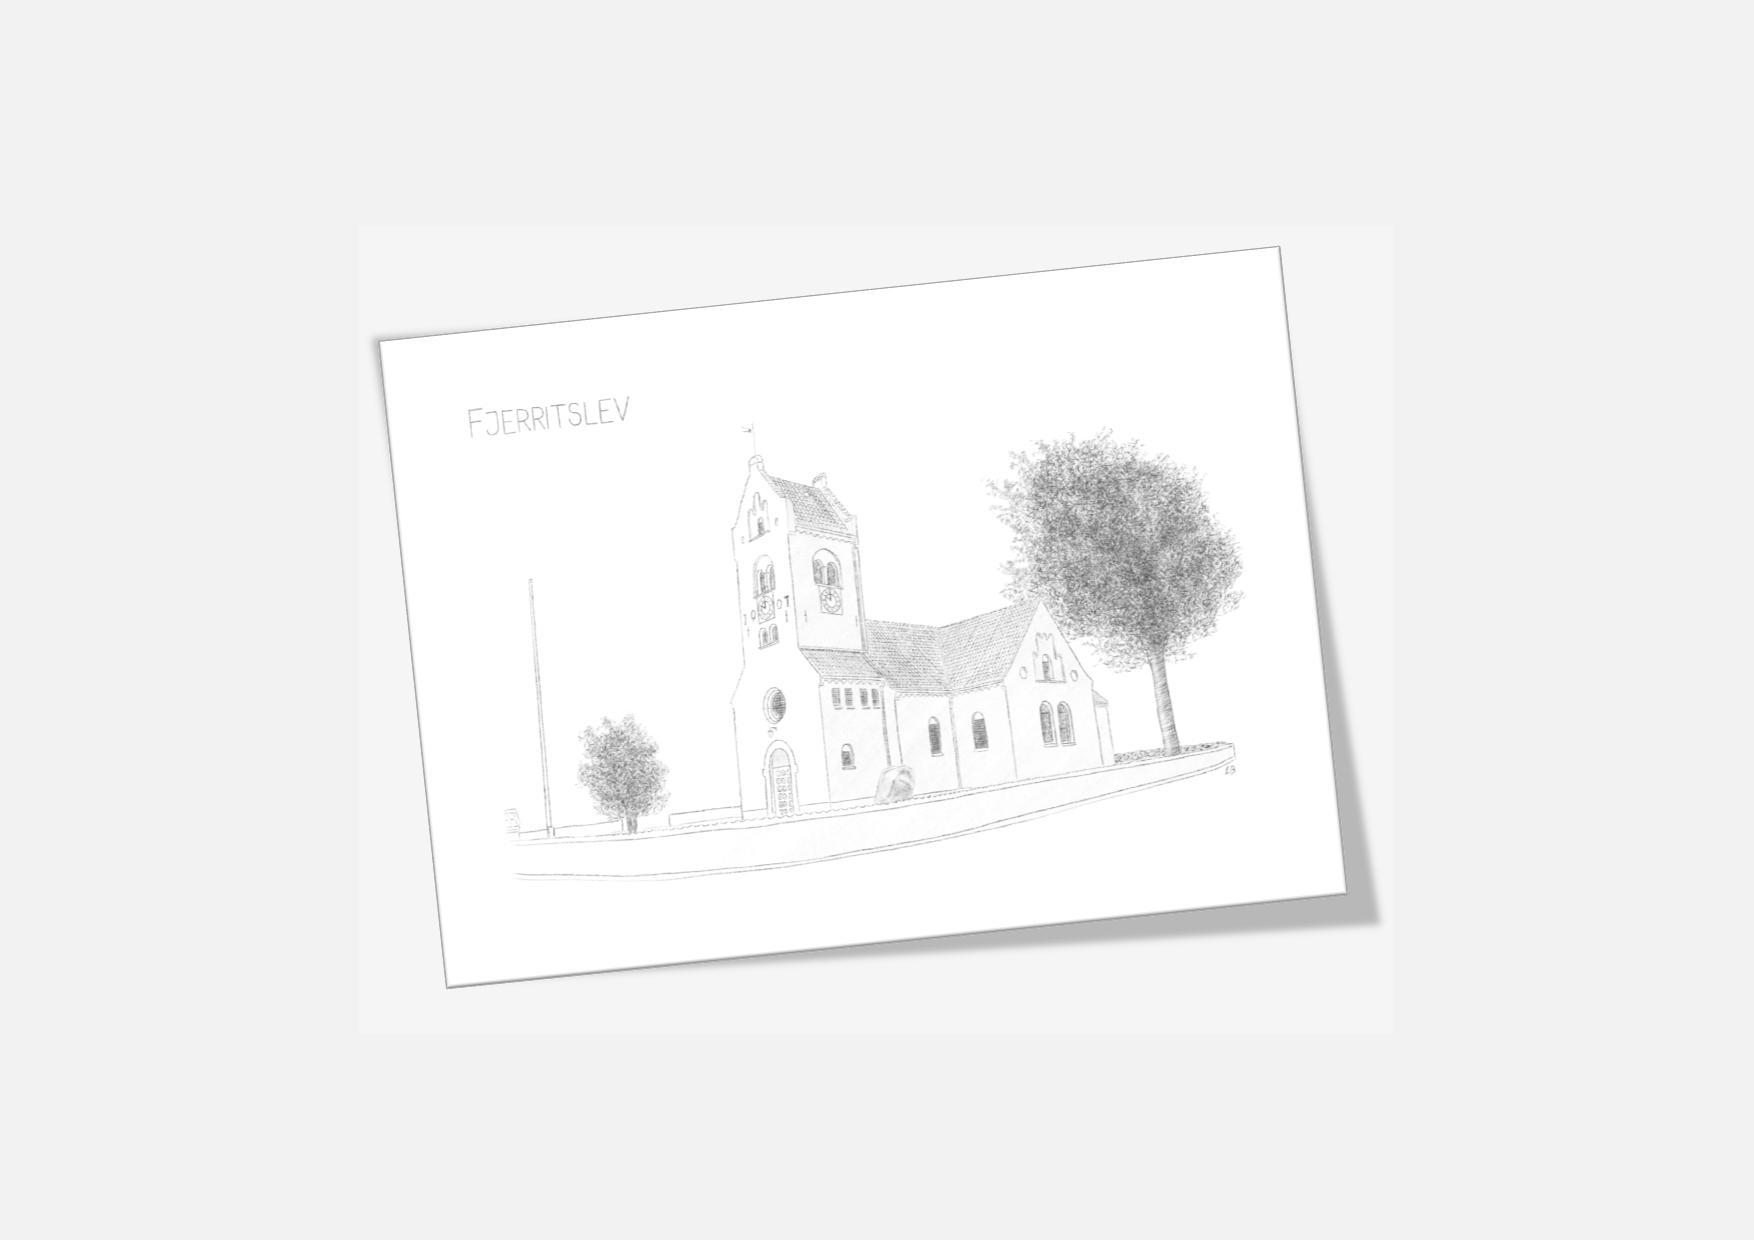 Varebillede Fjerritslev Kirke kort